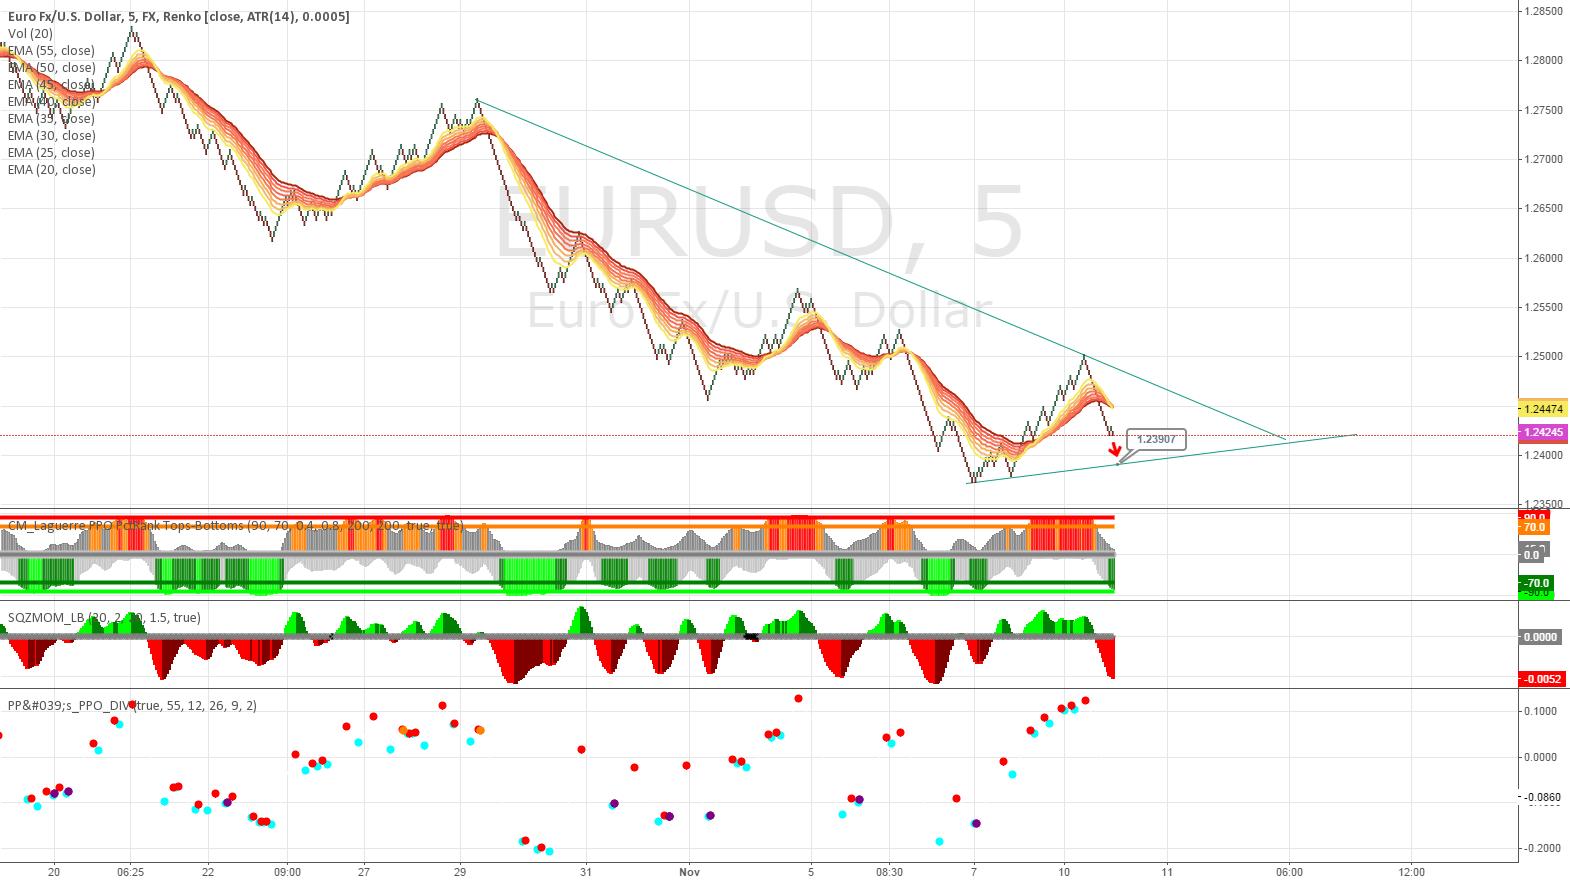 EURUSD SHORT (Renko Chart)